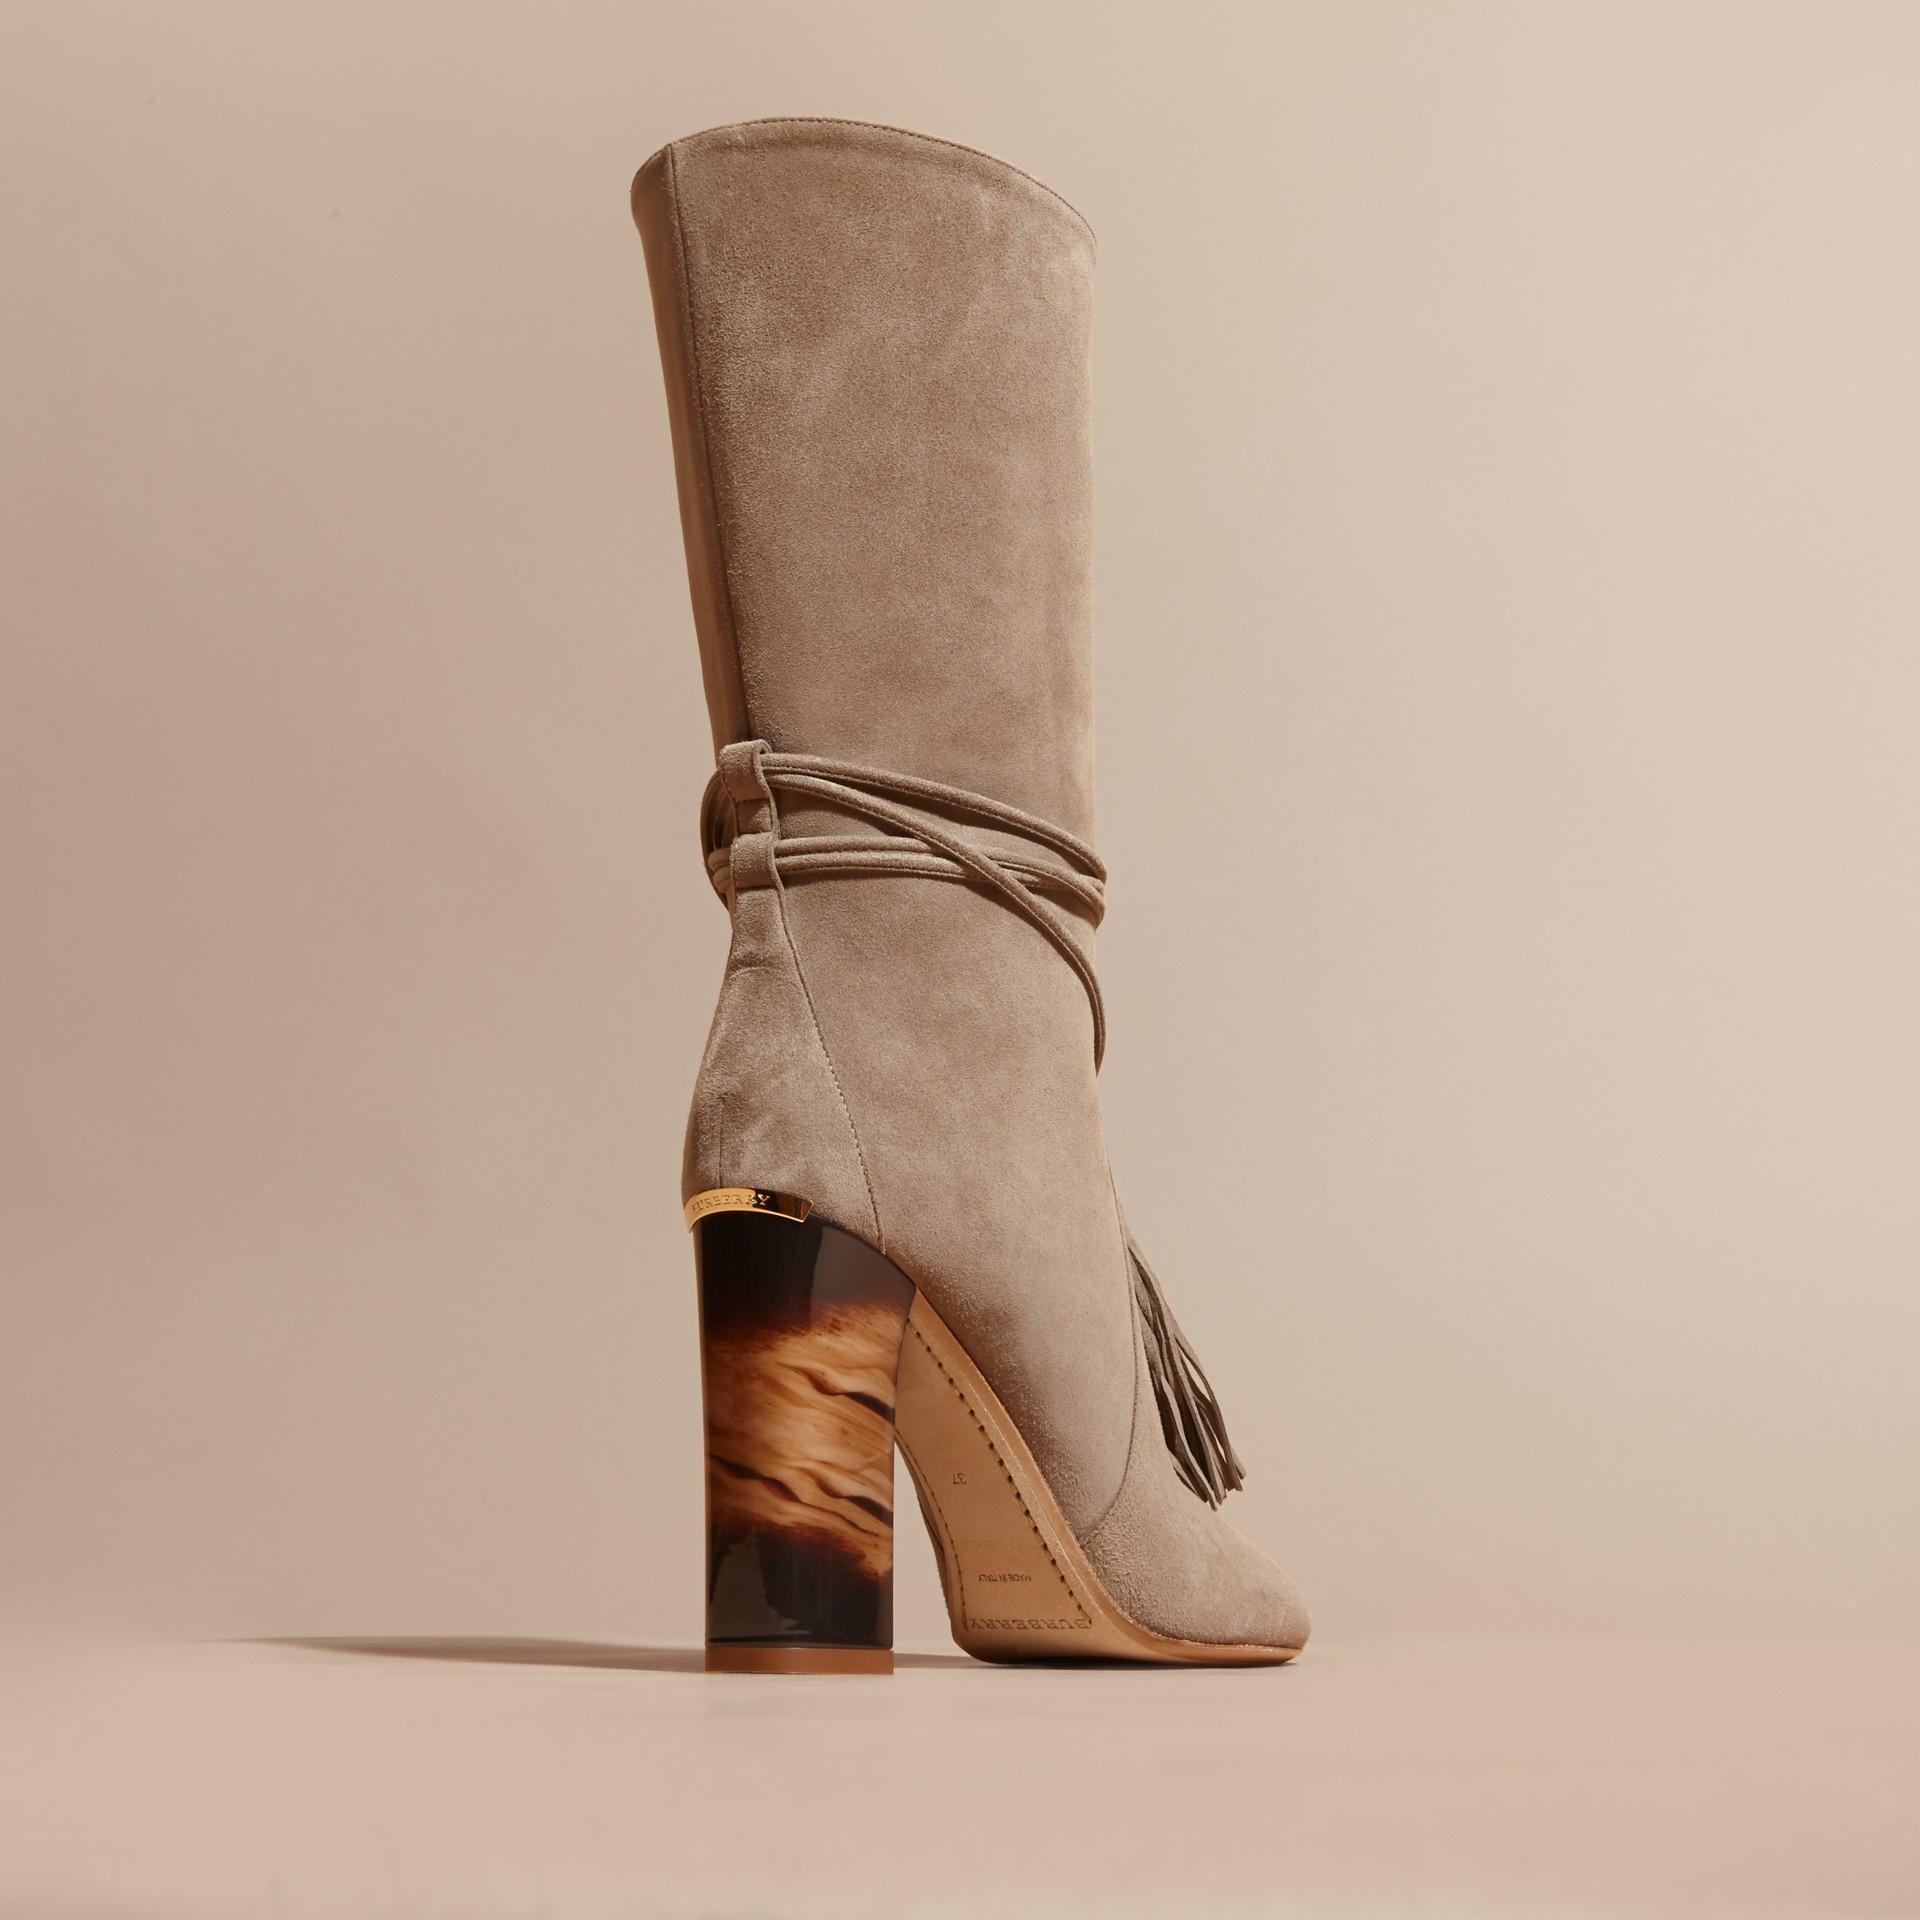 Dark heather melange Tasselled Suede Pull-on Boots - gallery image 4